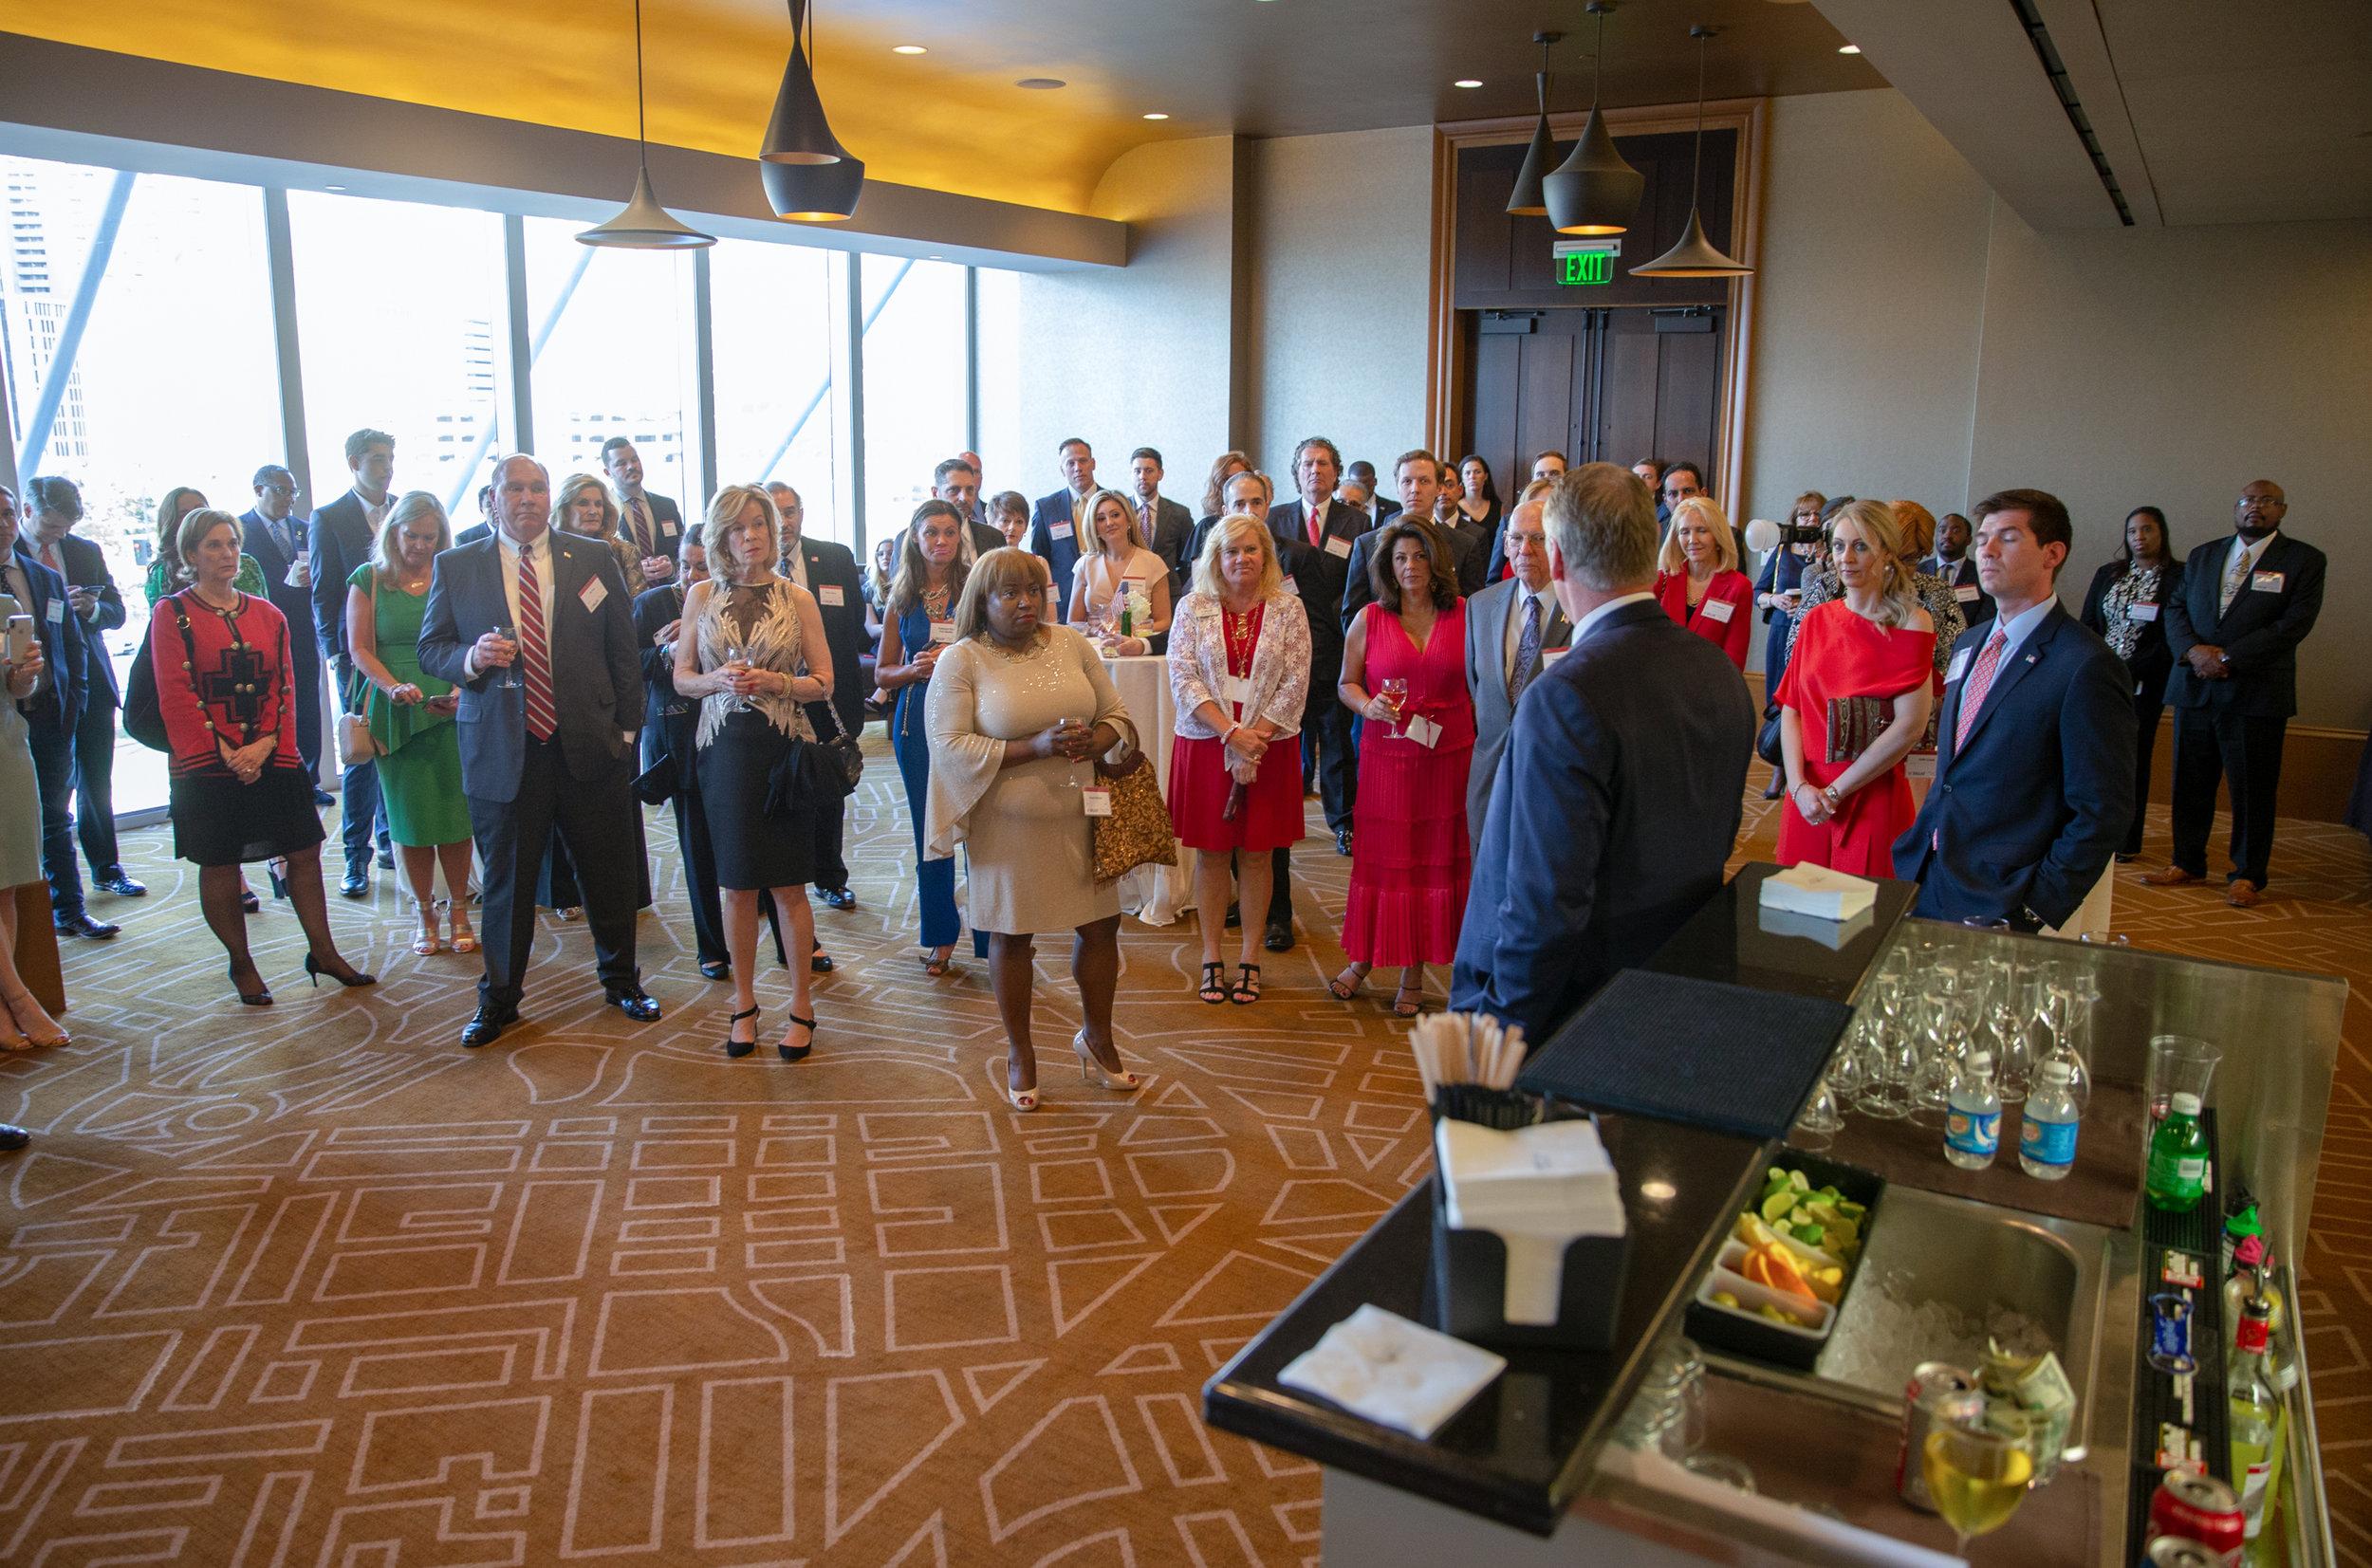 Dallas County's annual Reagan Day dinner reception with former Secretary Ryan Zinke and former EPA Administrator Scott Pruitt in 2019.